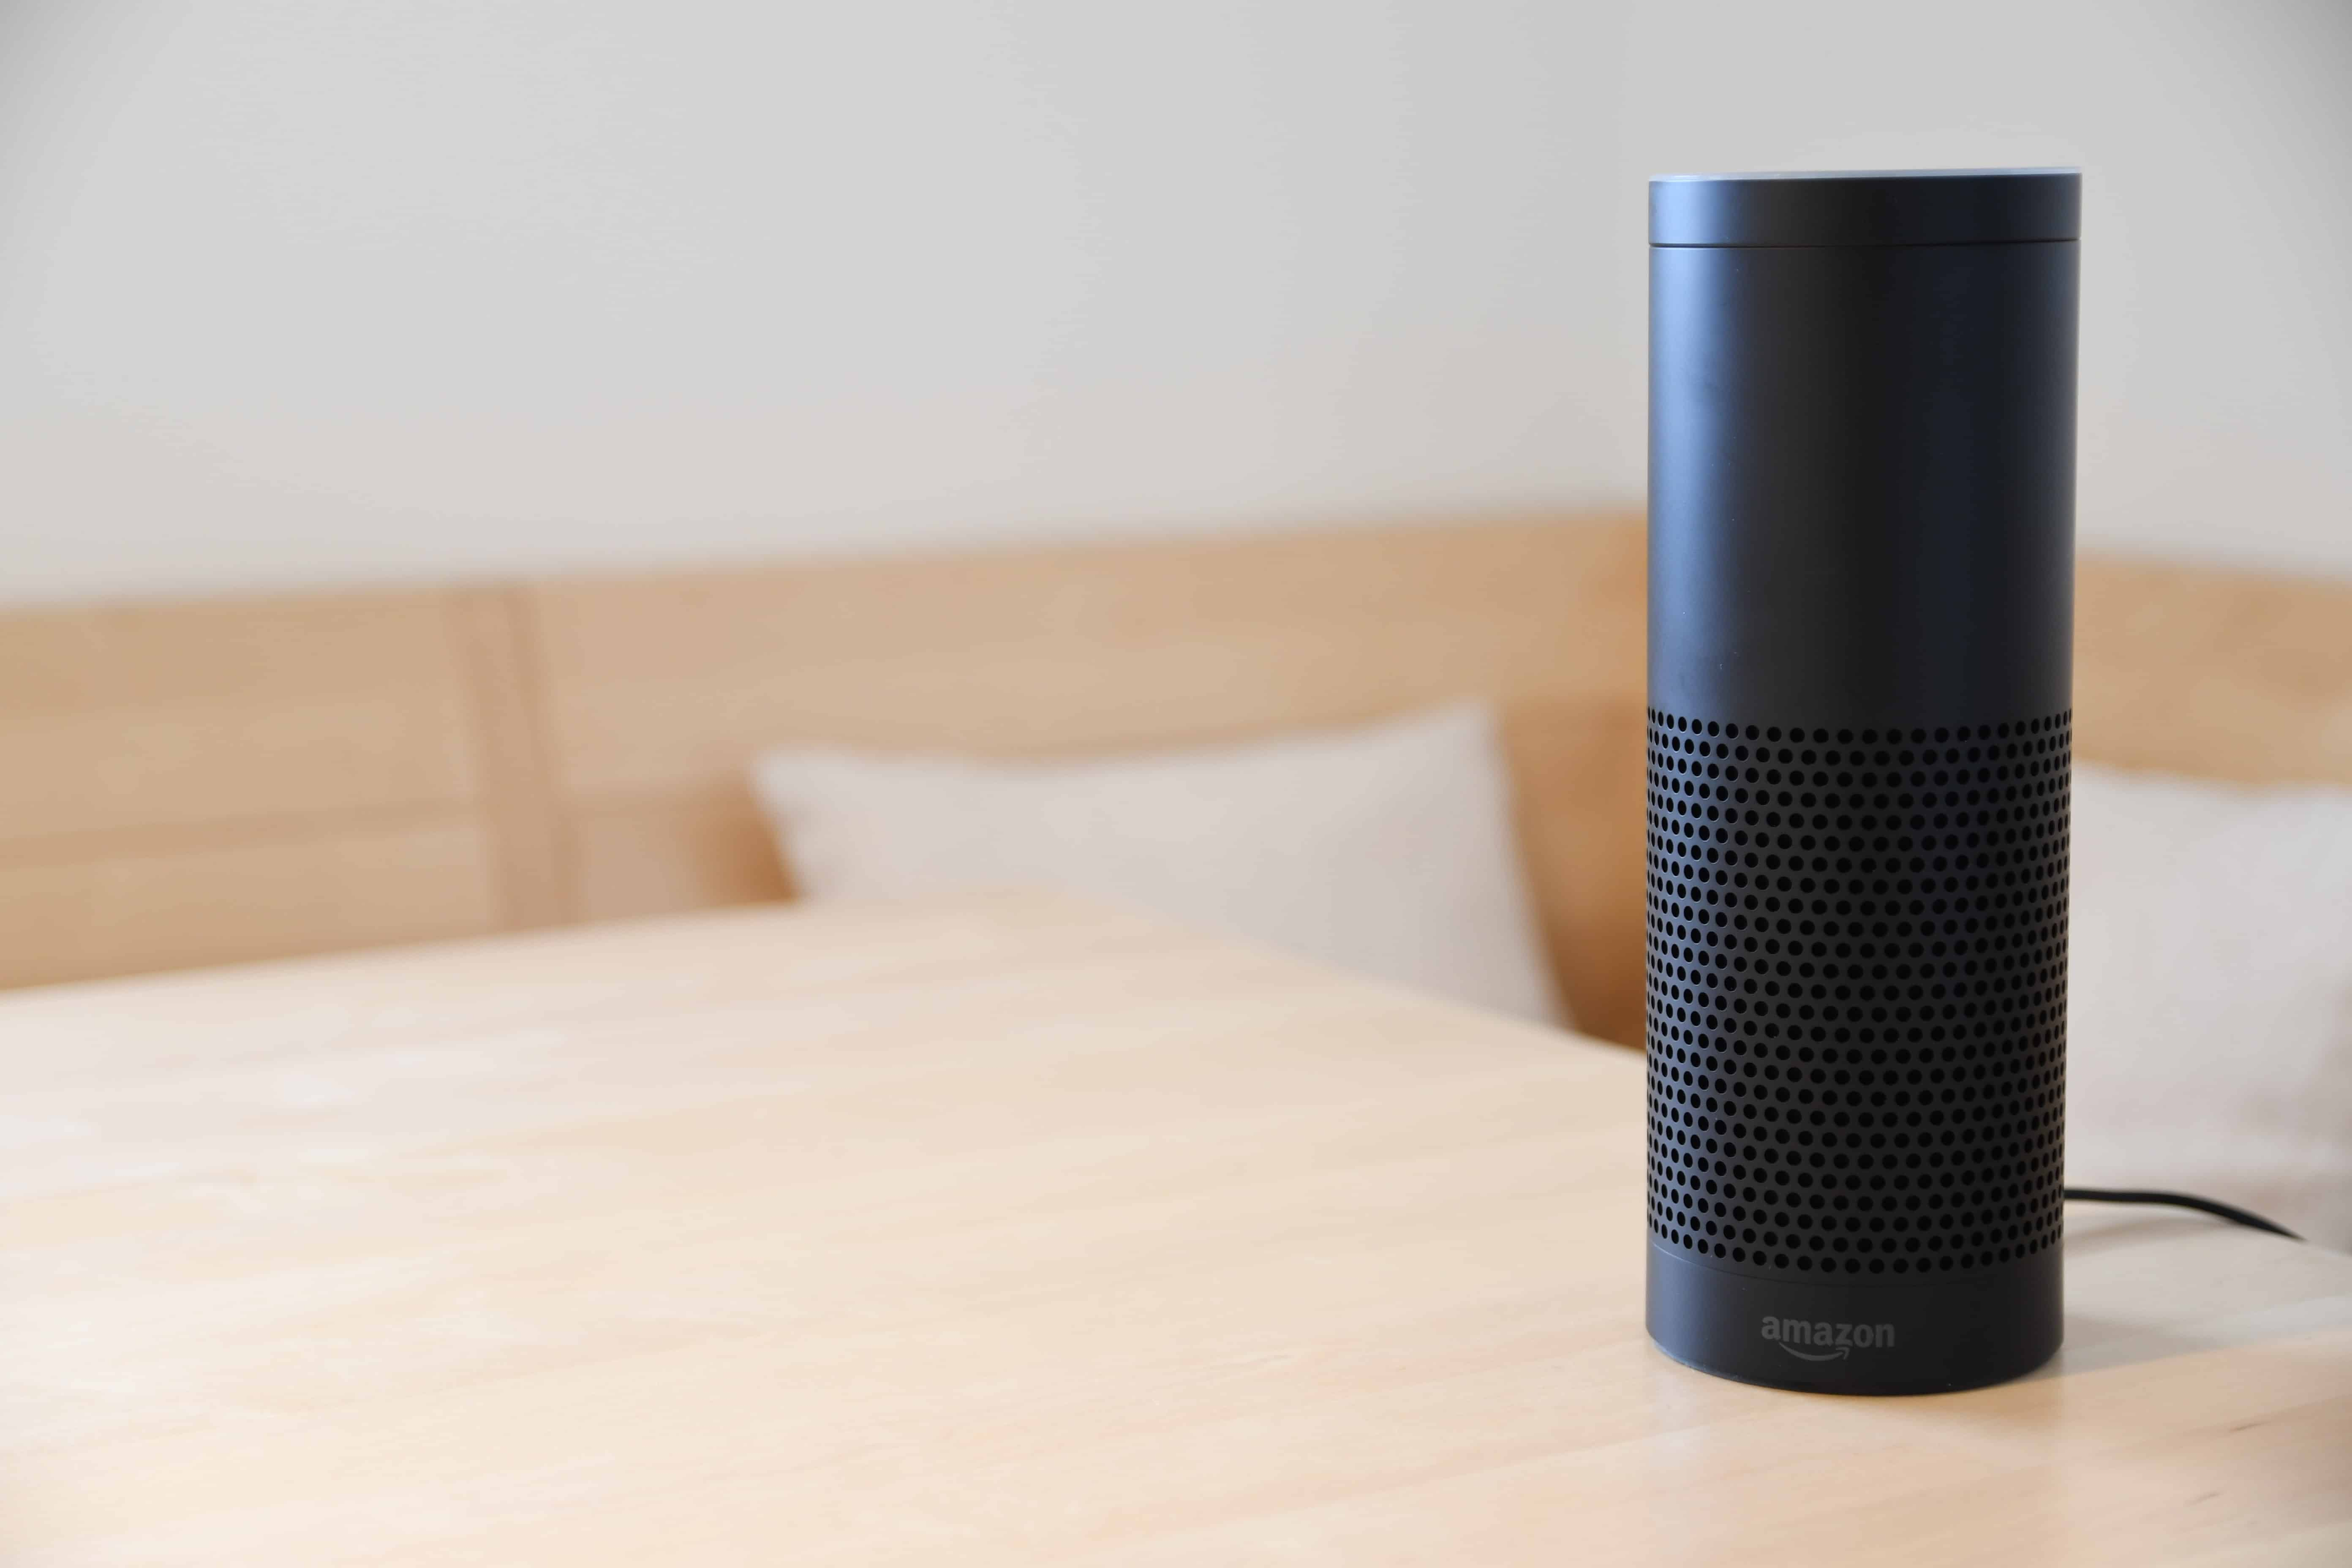 Alexa - amazon